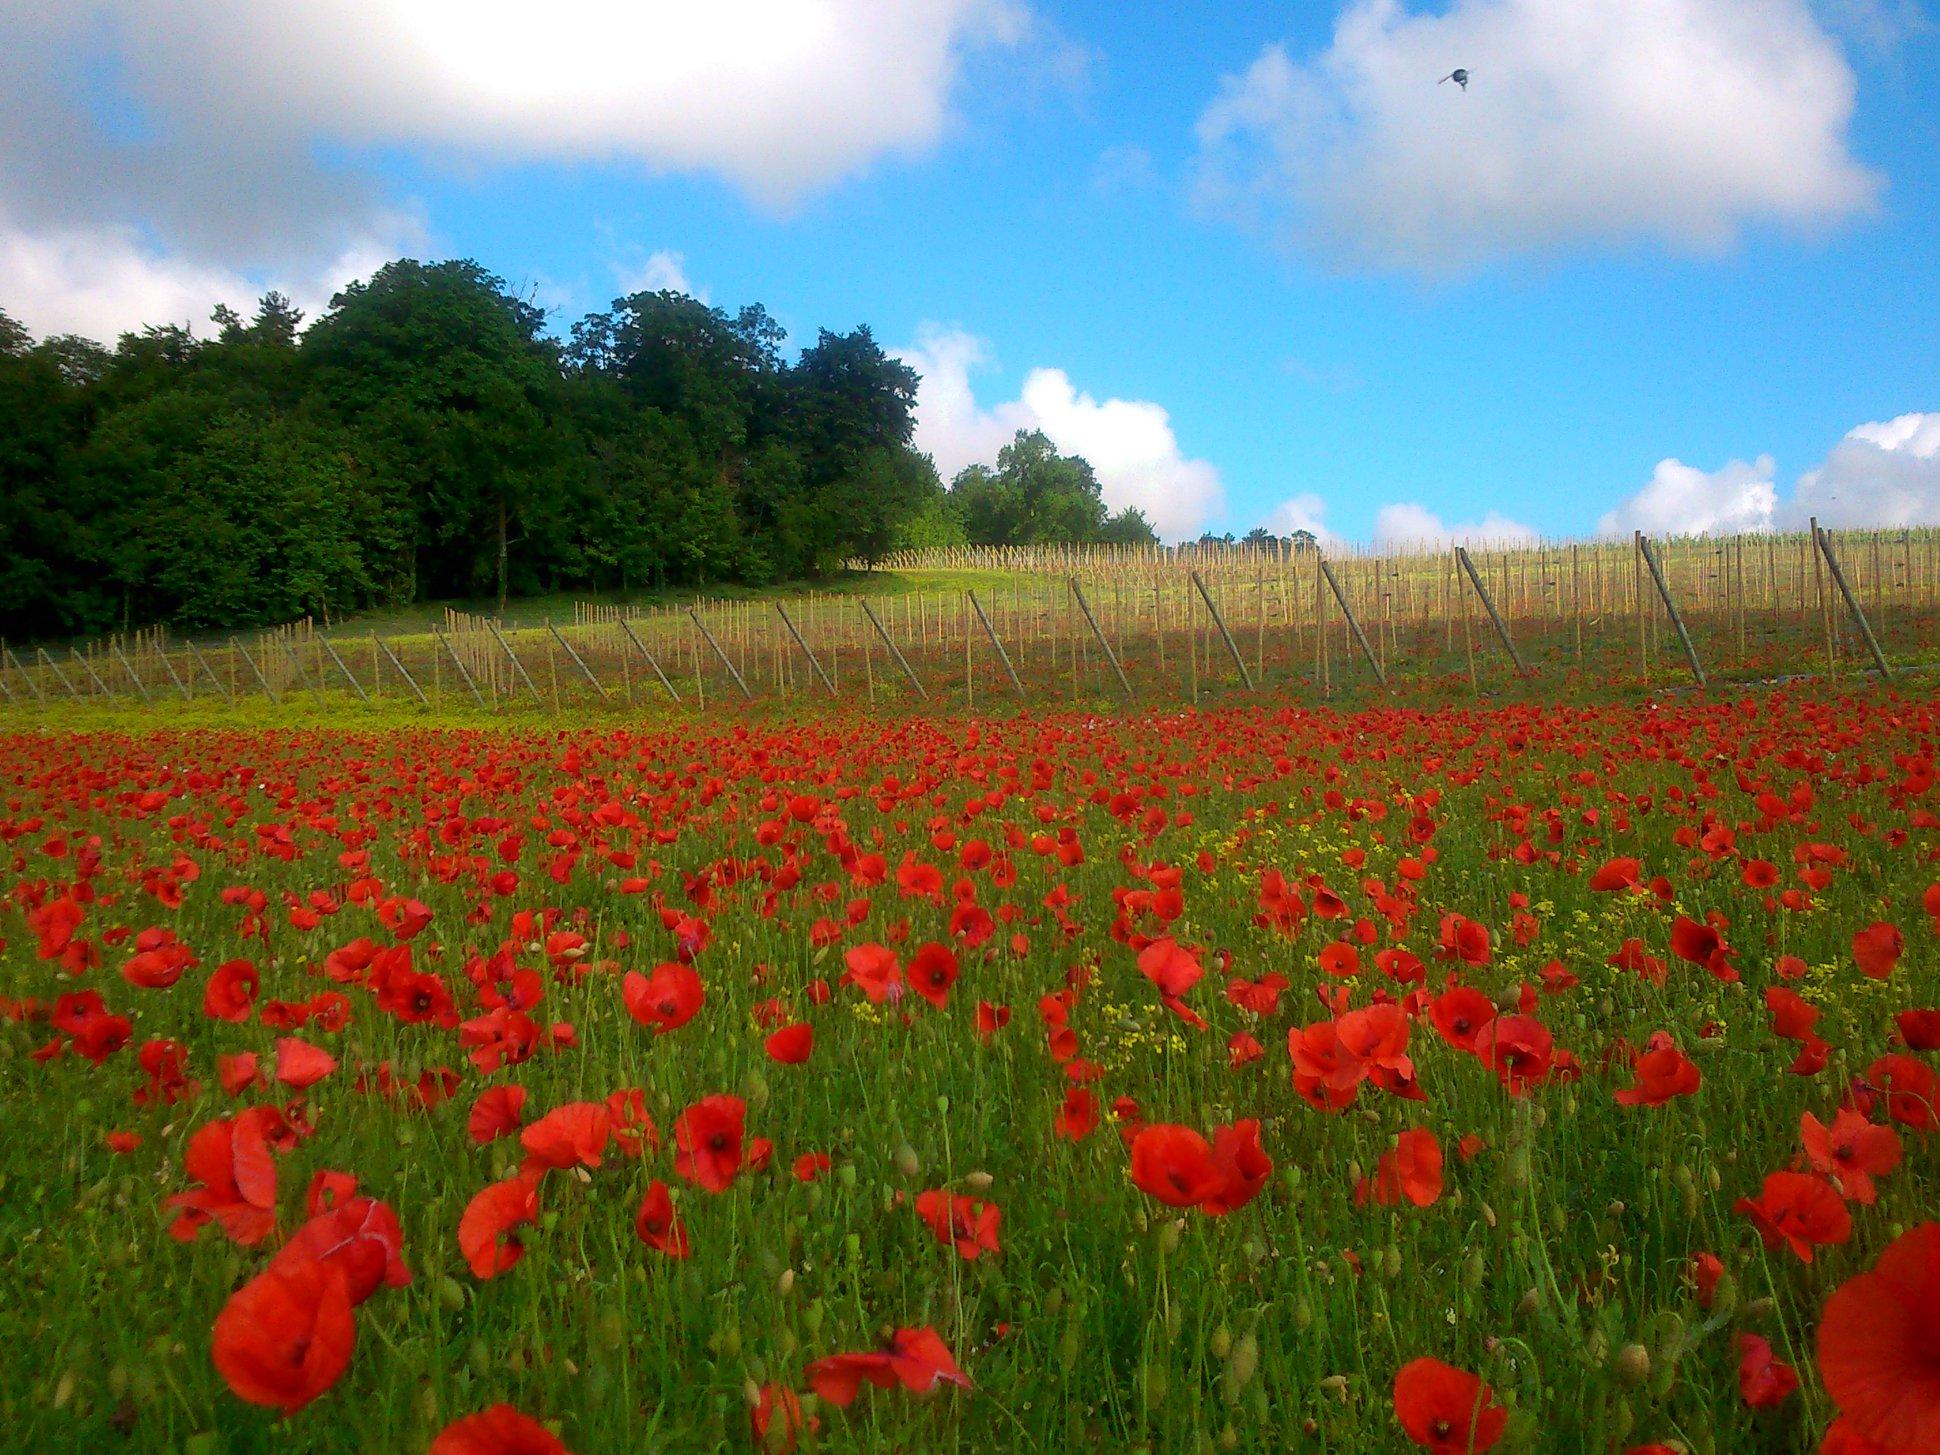 Arpents du Soleil - Poppies flowers